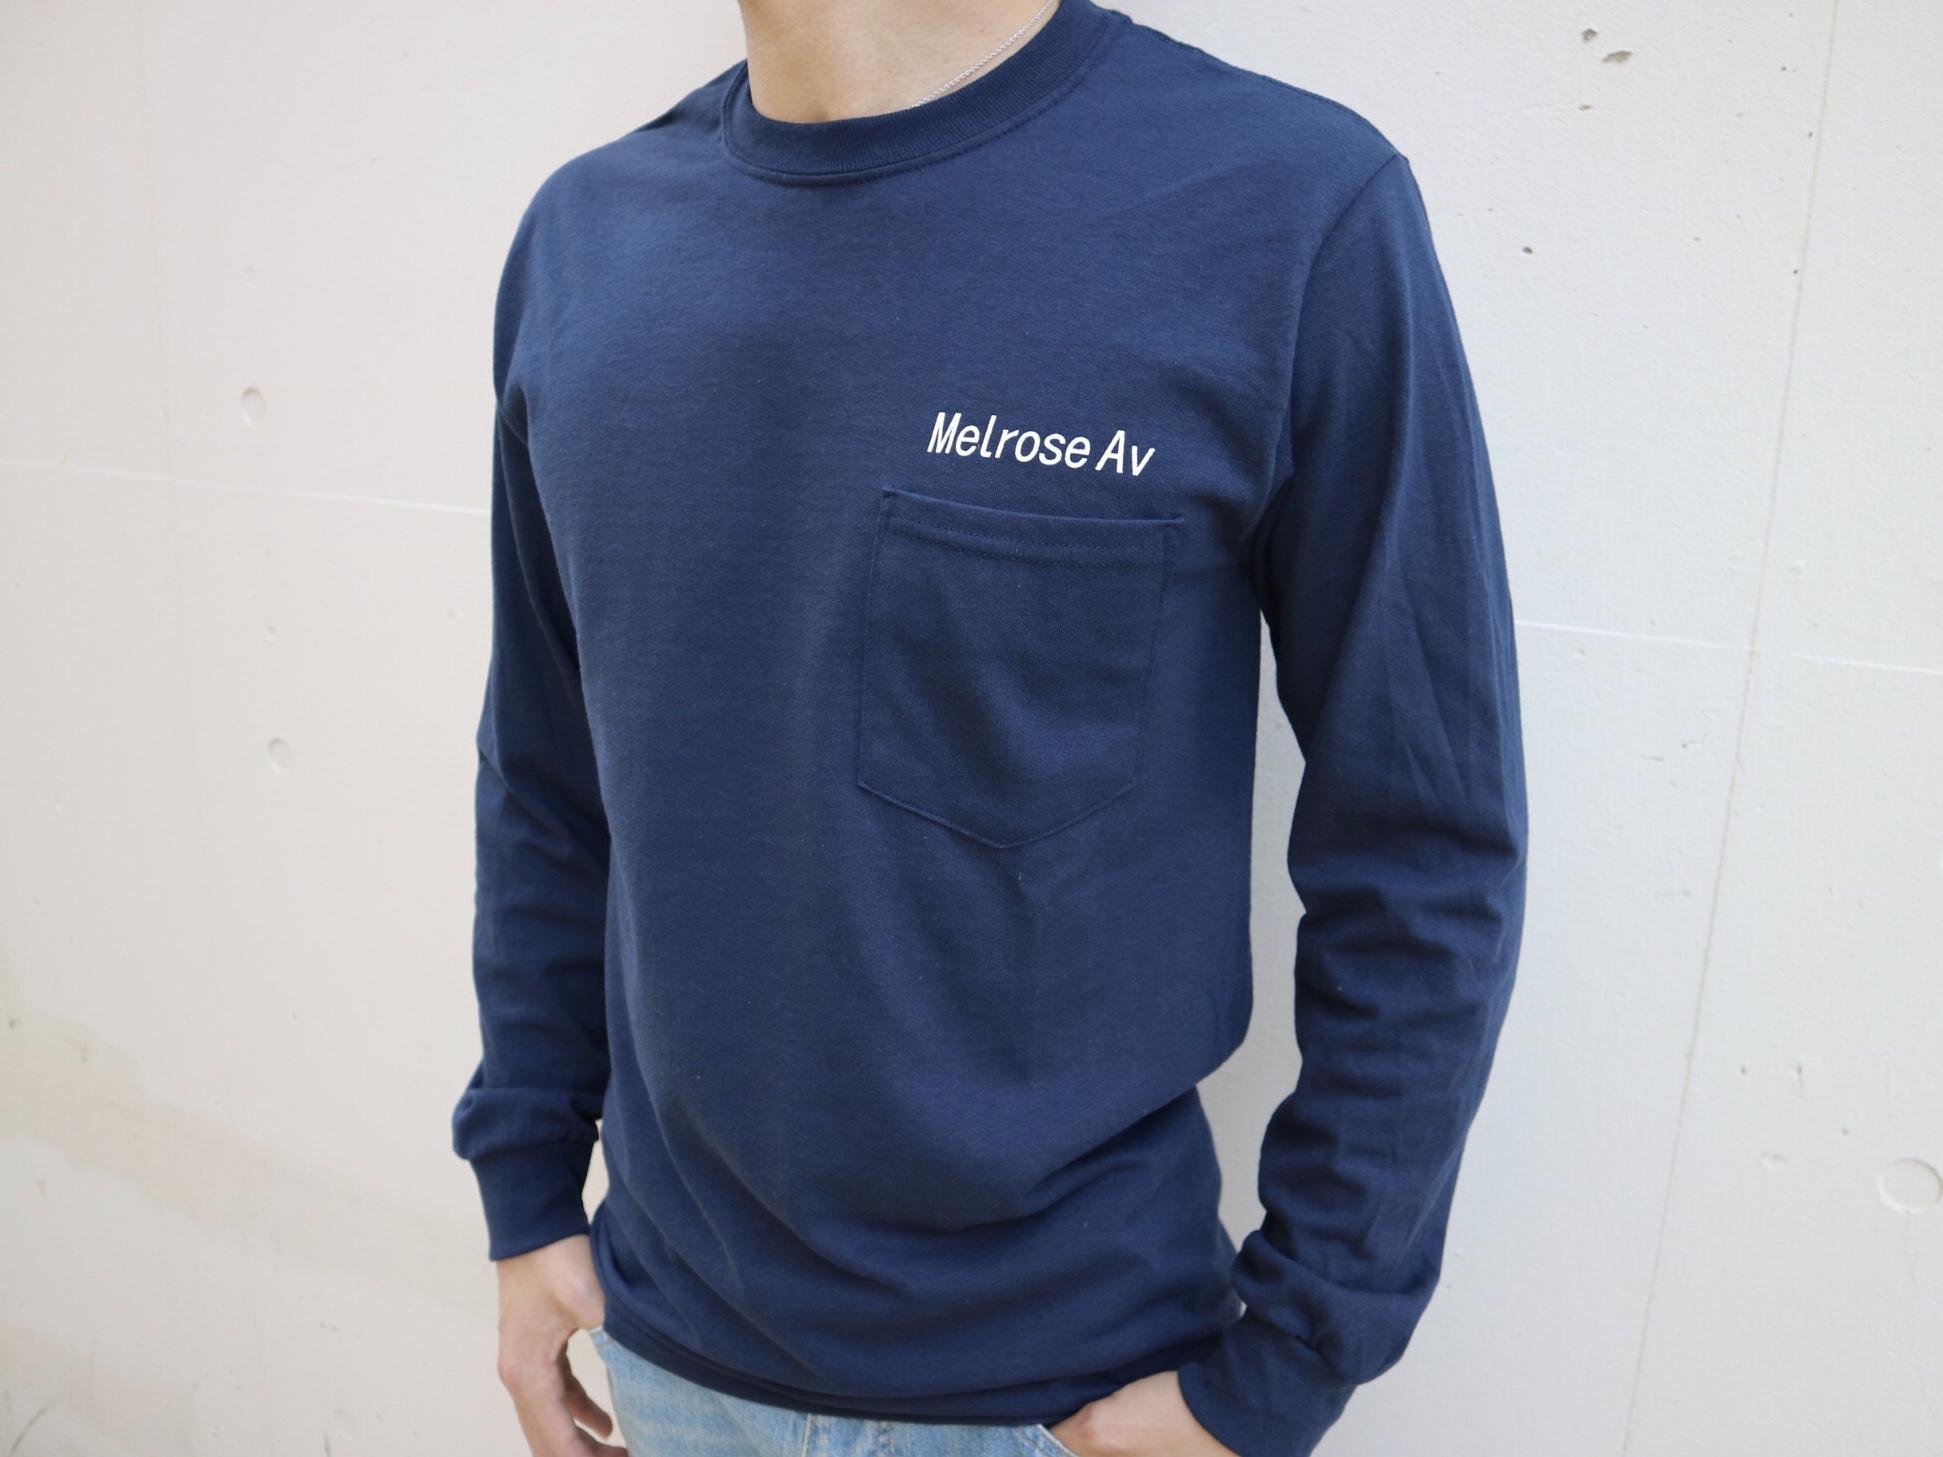 LA Melrose ポケットロングTシャツ(navy)